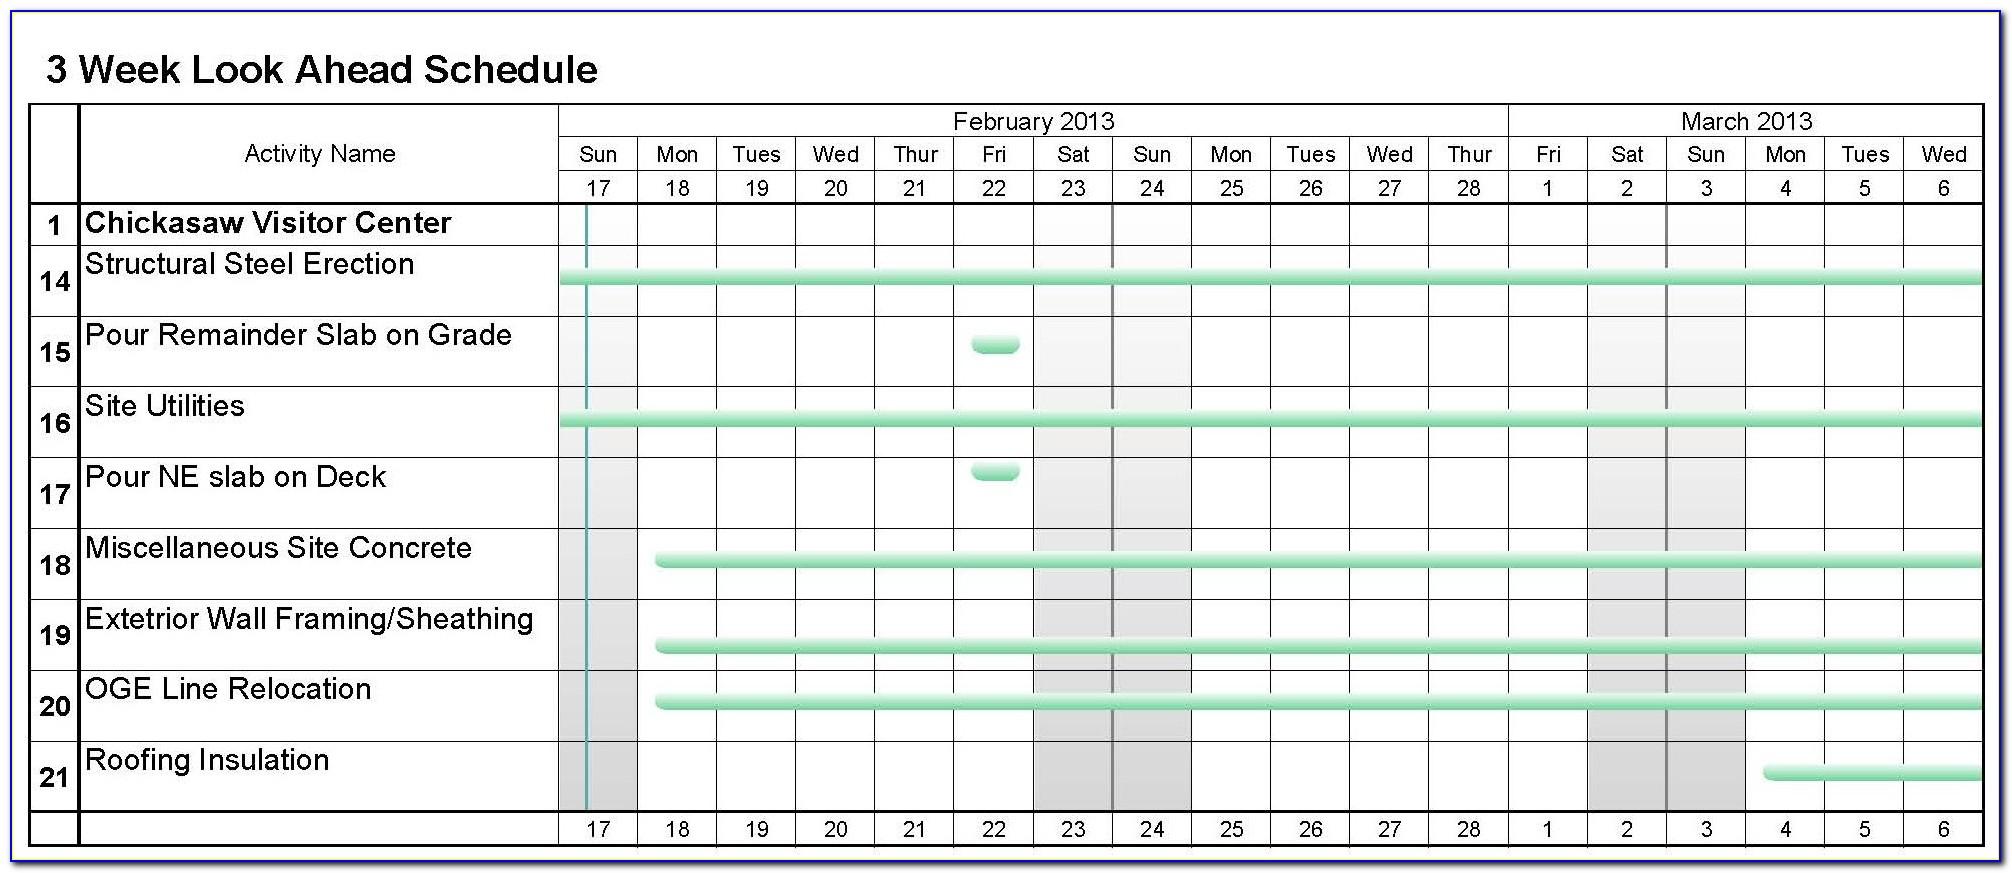 3 Week Look Ahead Construction Schedule Template Excel